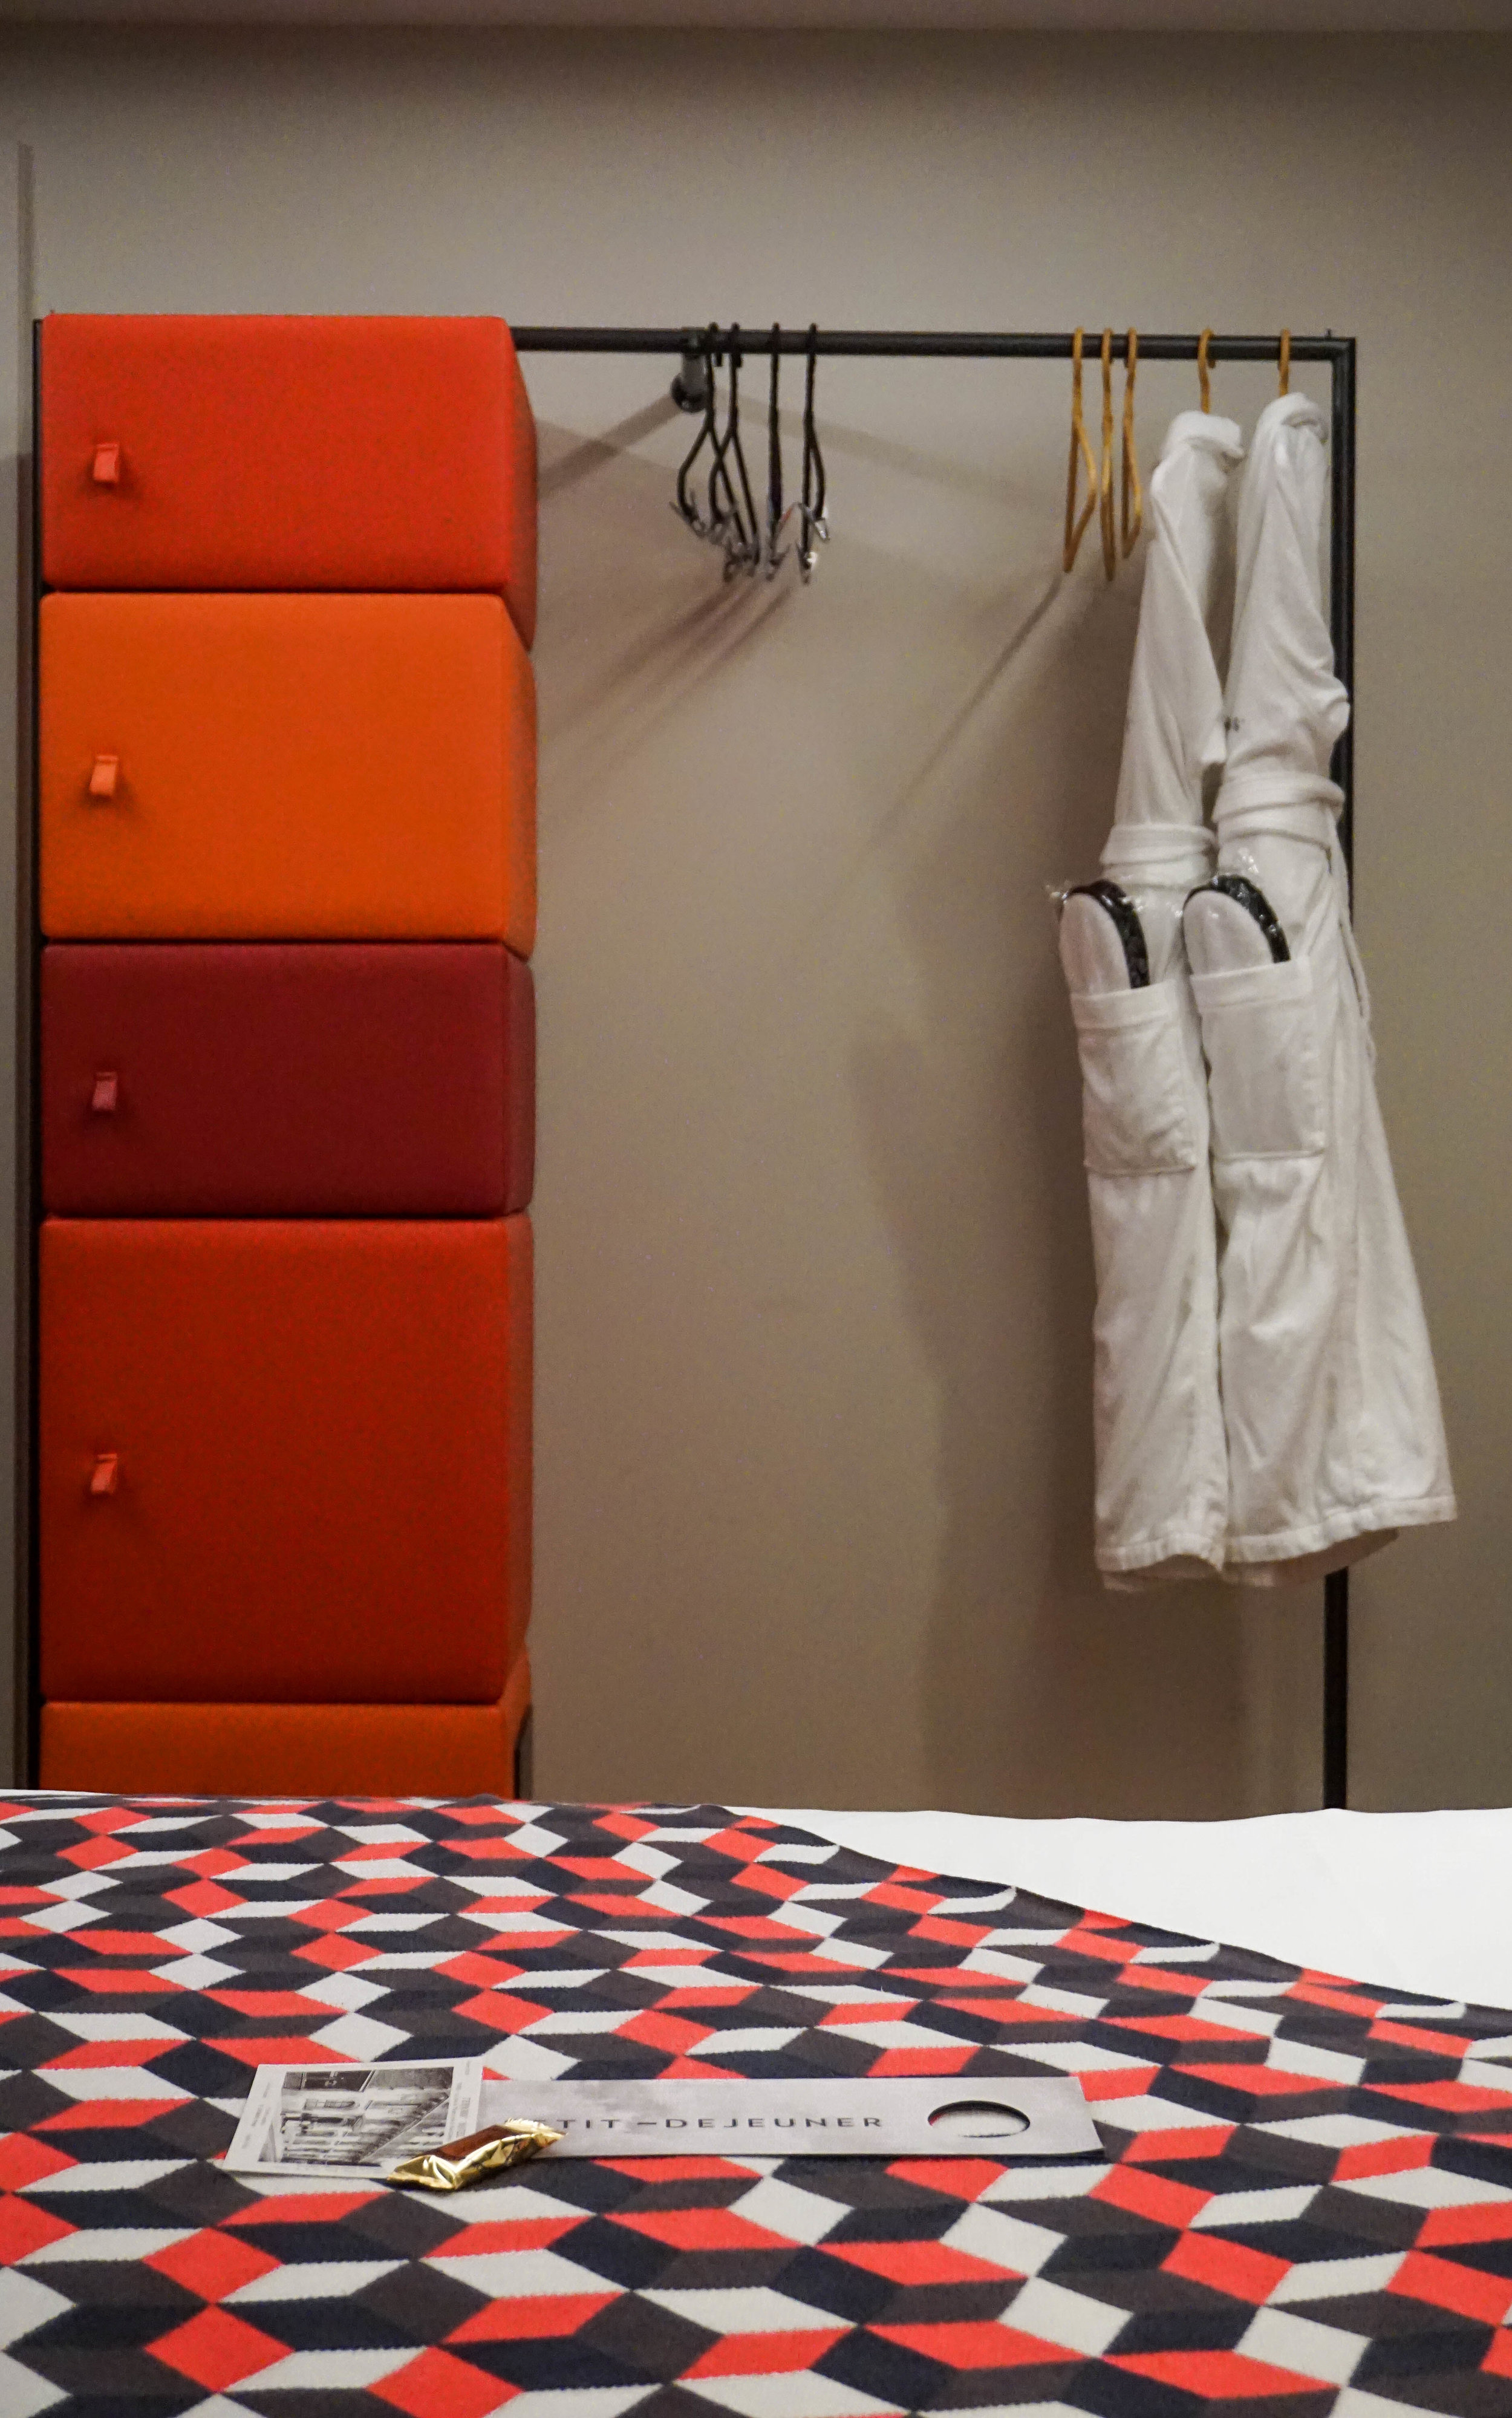 Paris-Terrass Hotel-artiste suite